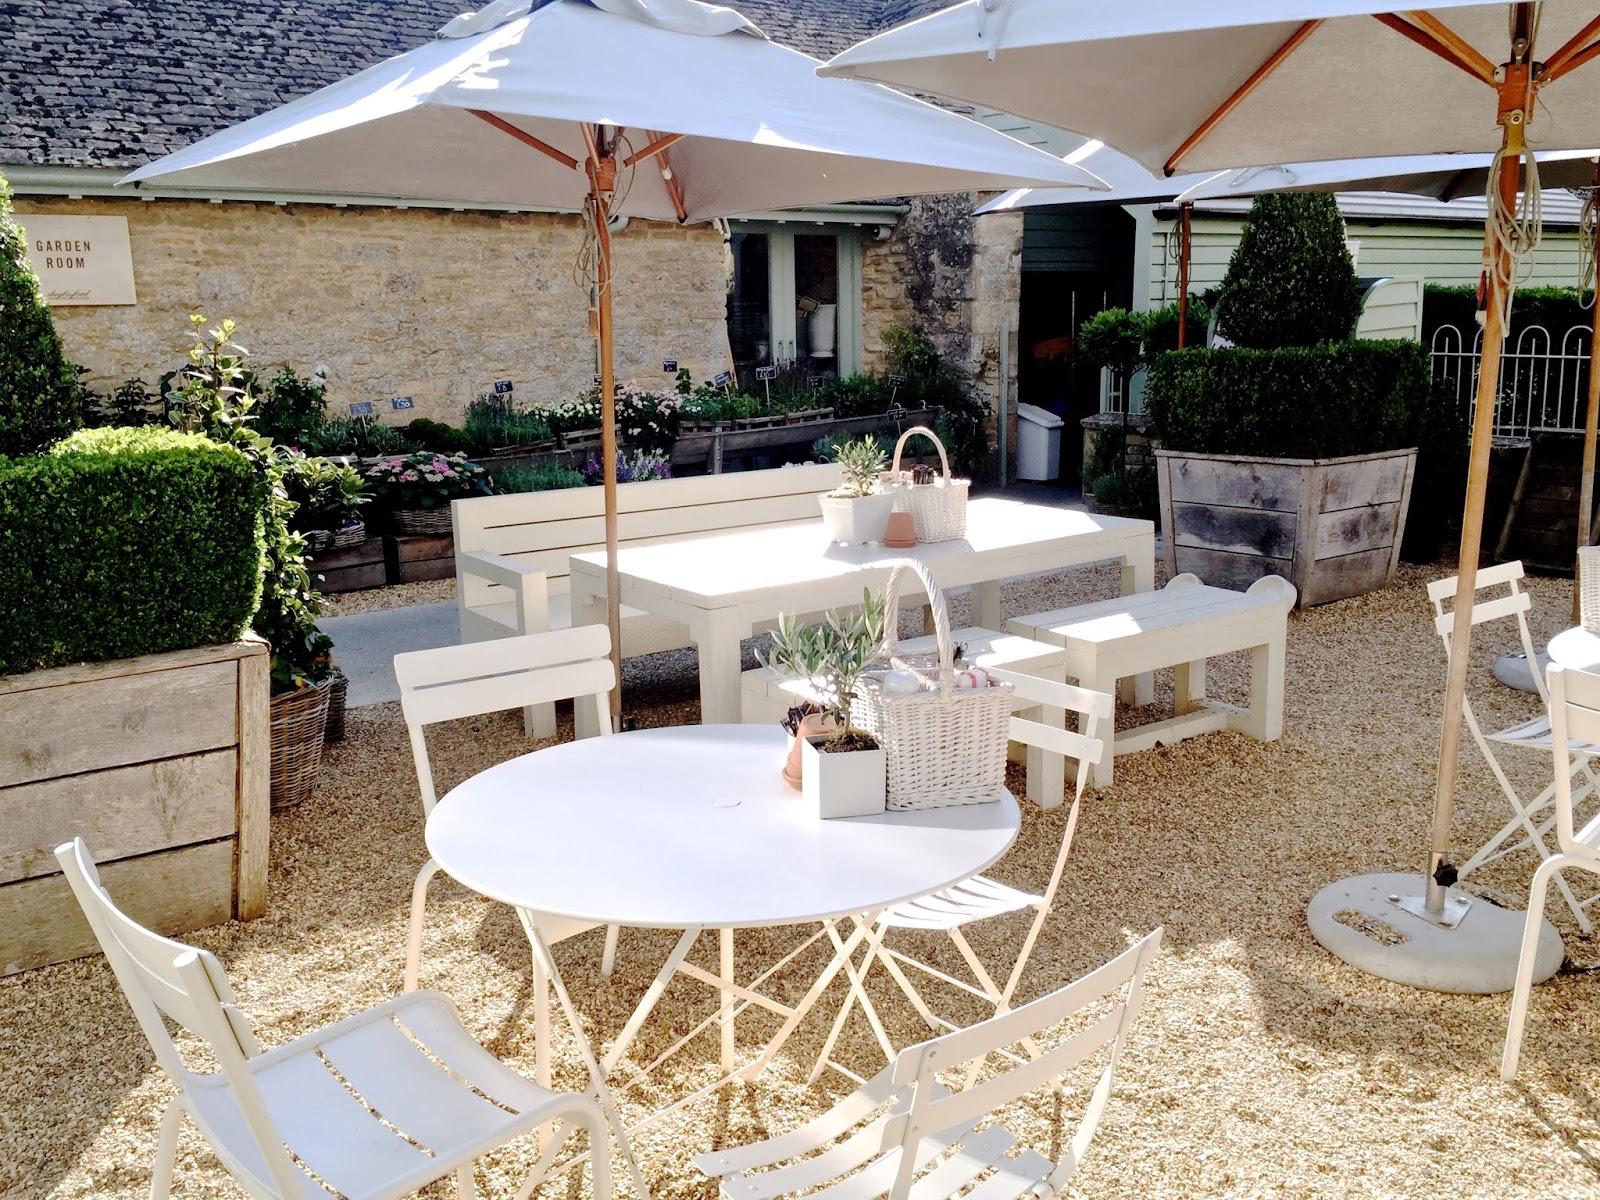 Daylesford Farm outdoor cafe